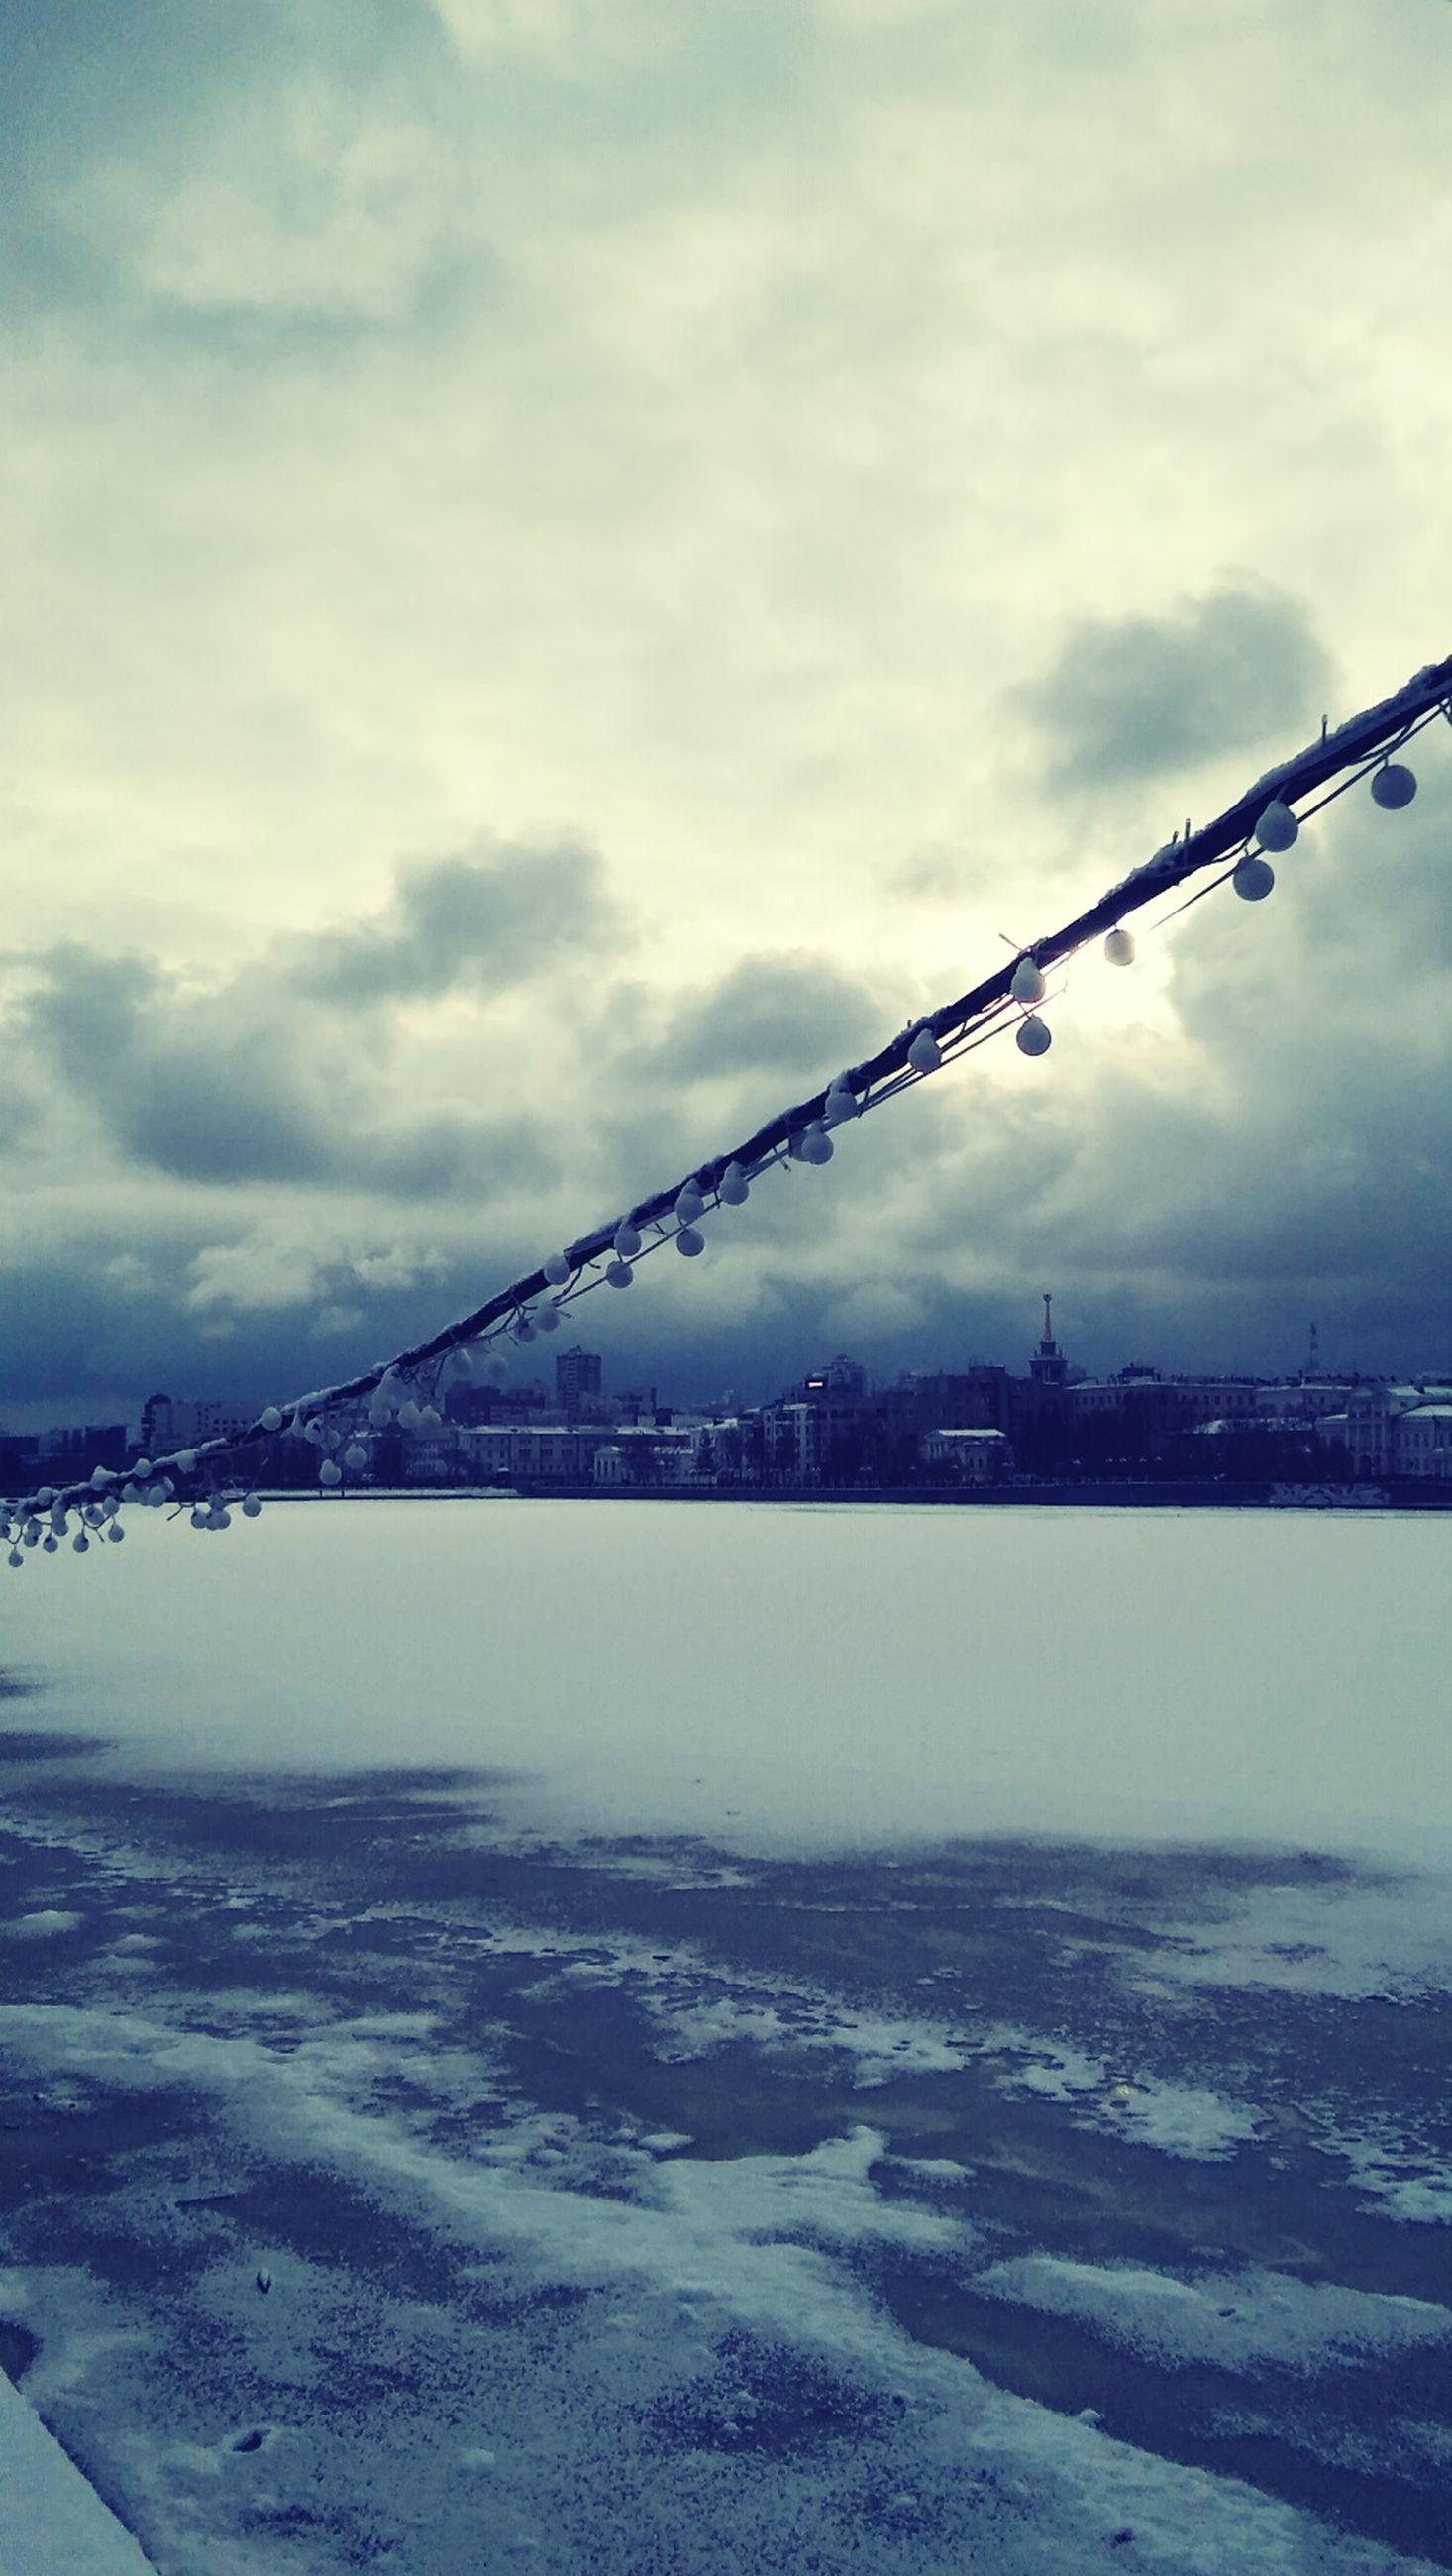 sky, water, connection, built structure, cloud - sky, bridge - man made structure, architecture, sea, suspension bridge, river, engineering, transportation, waterfront, cloudy, nature, cloud, outdoors, weather, city, dusk